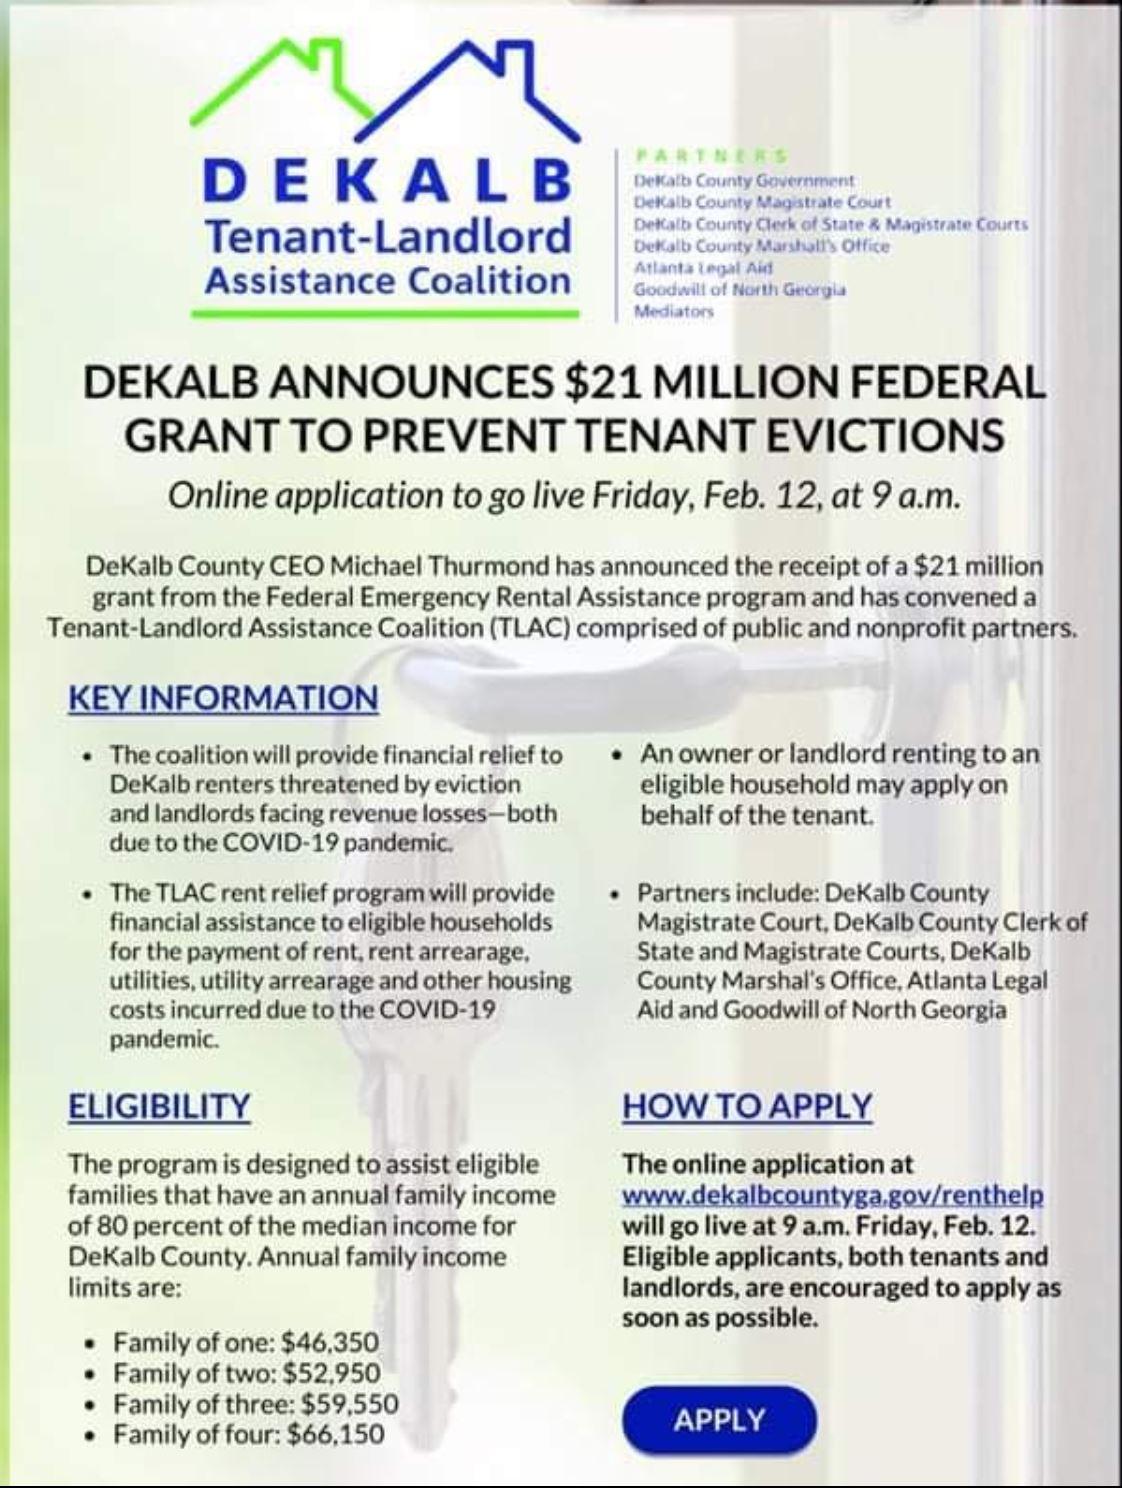 DeKalb Tenant-Landlord Assistance Coalition